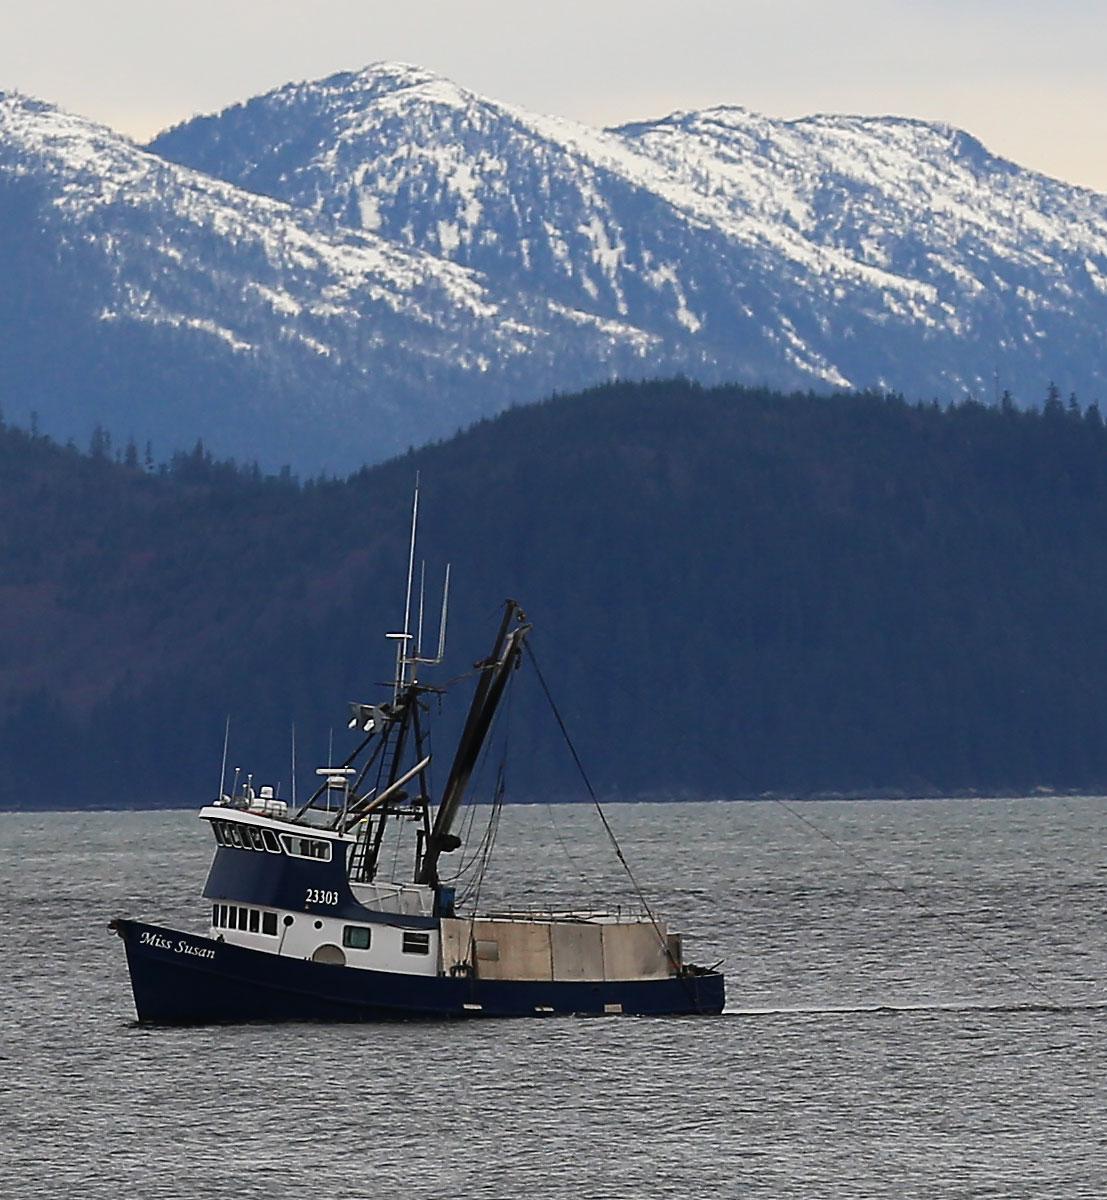 Shrimp_Miss_Susan_trawler_fishing_shrimping_8646.jpg